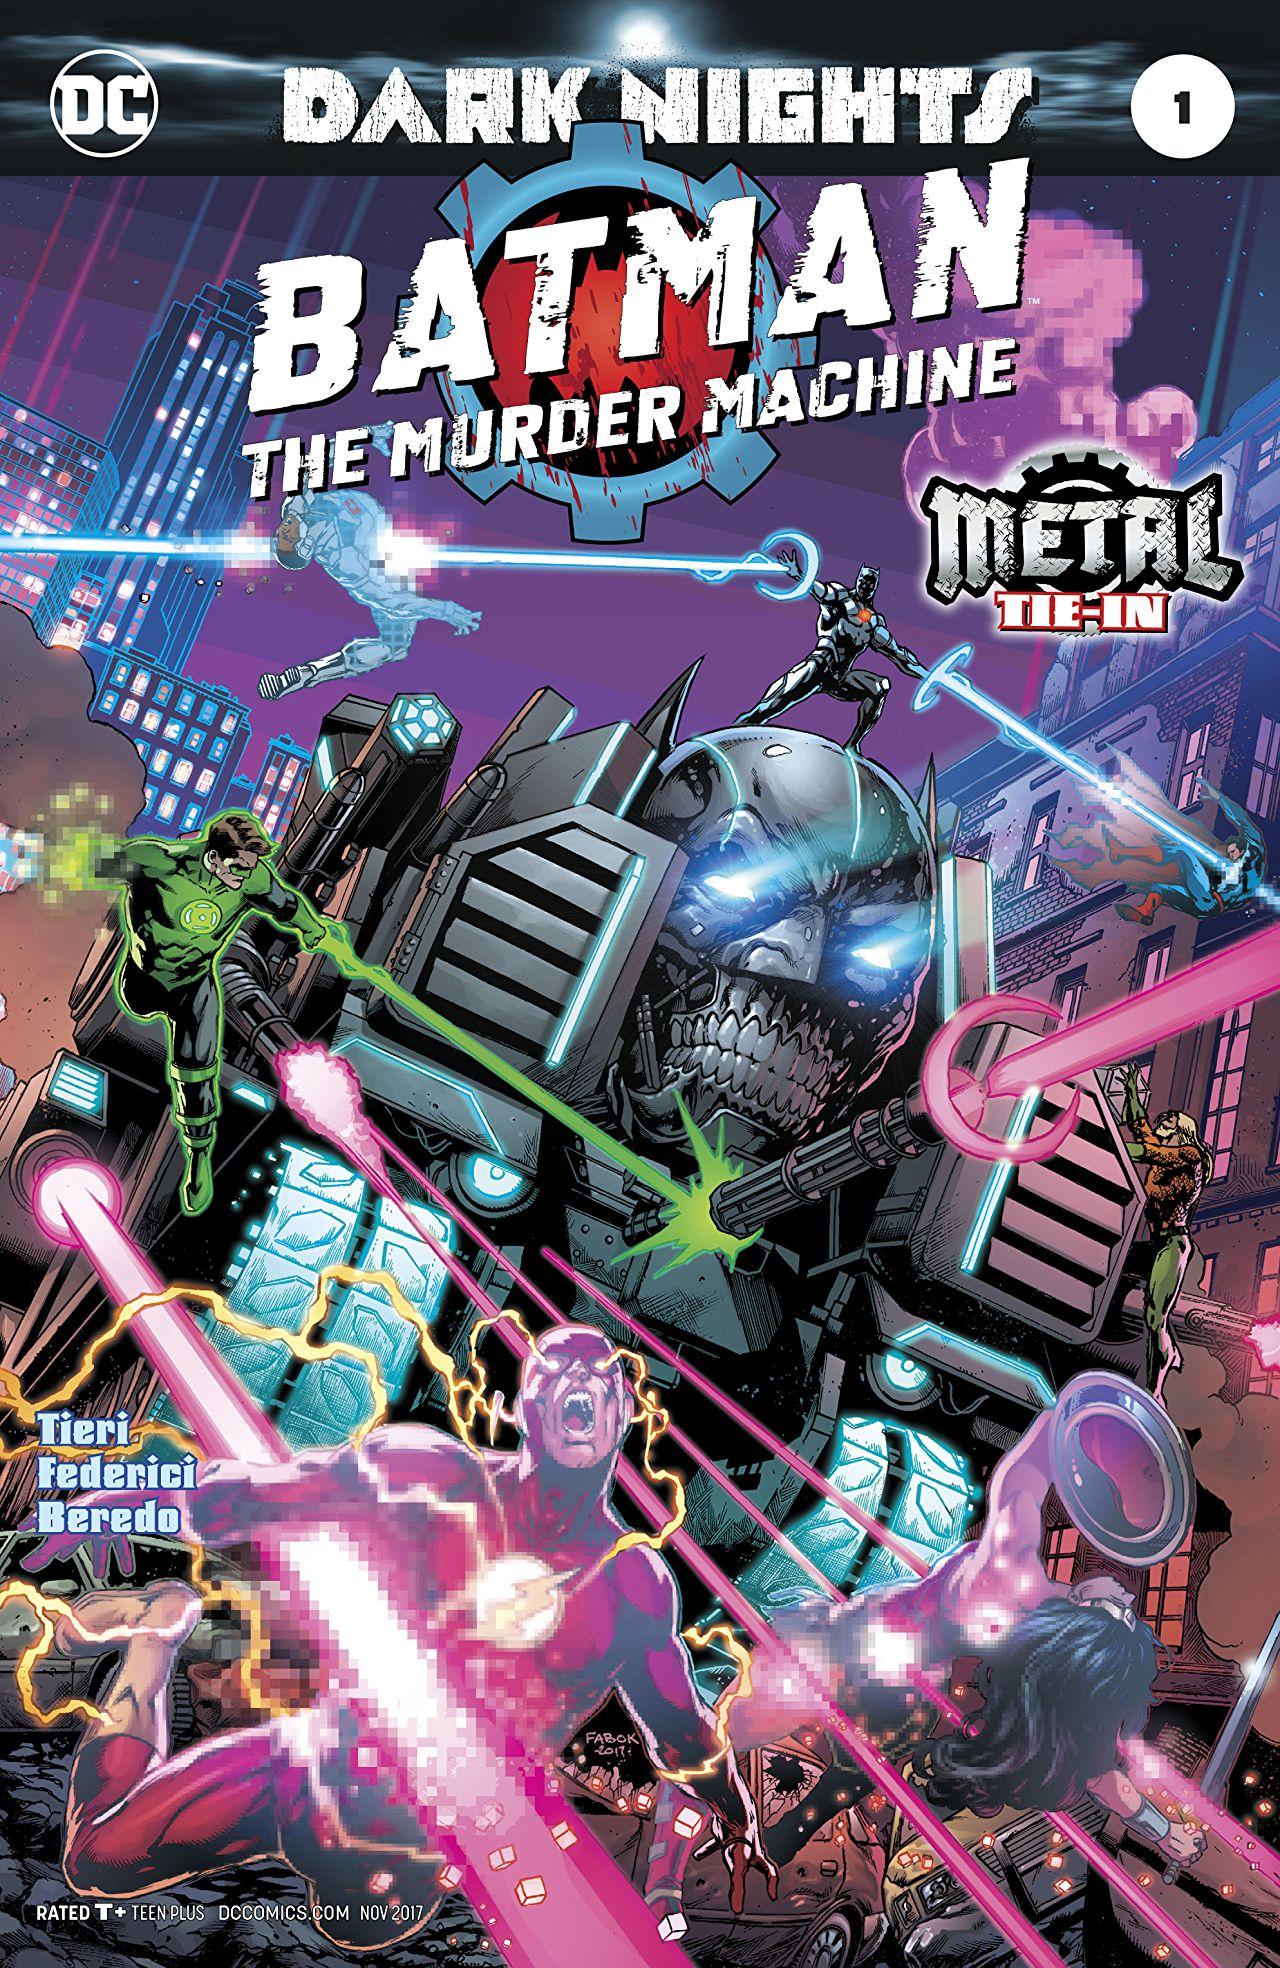 Batman_The_Murder_Machine_Vol_1_1.jpg